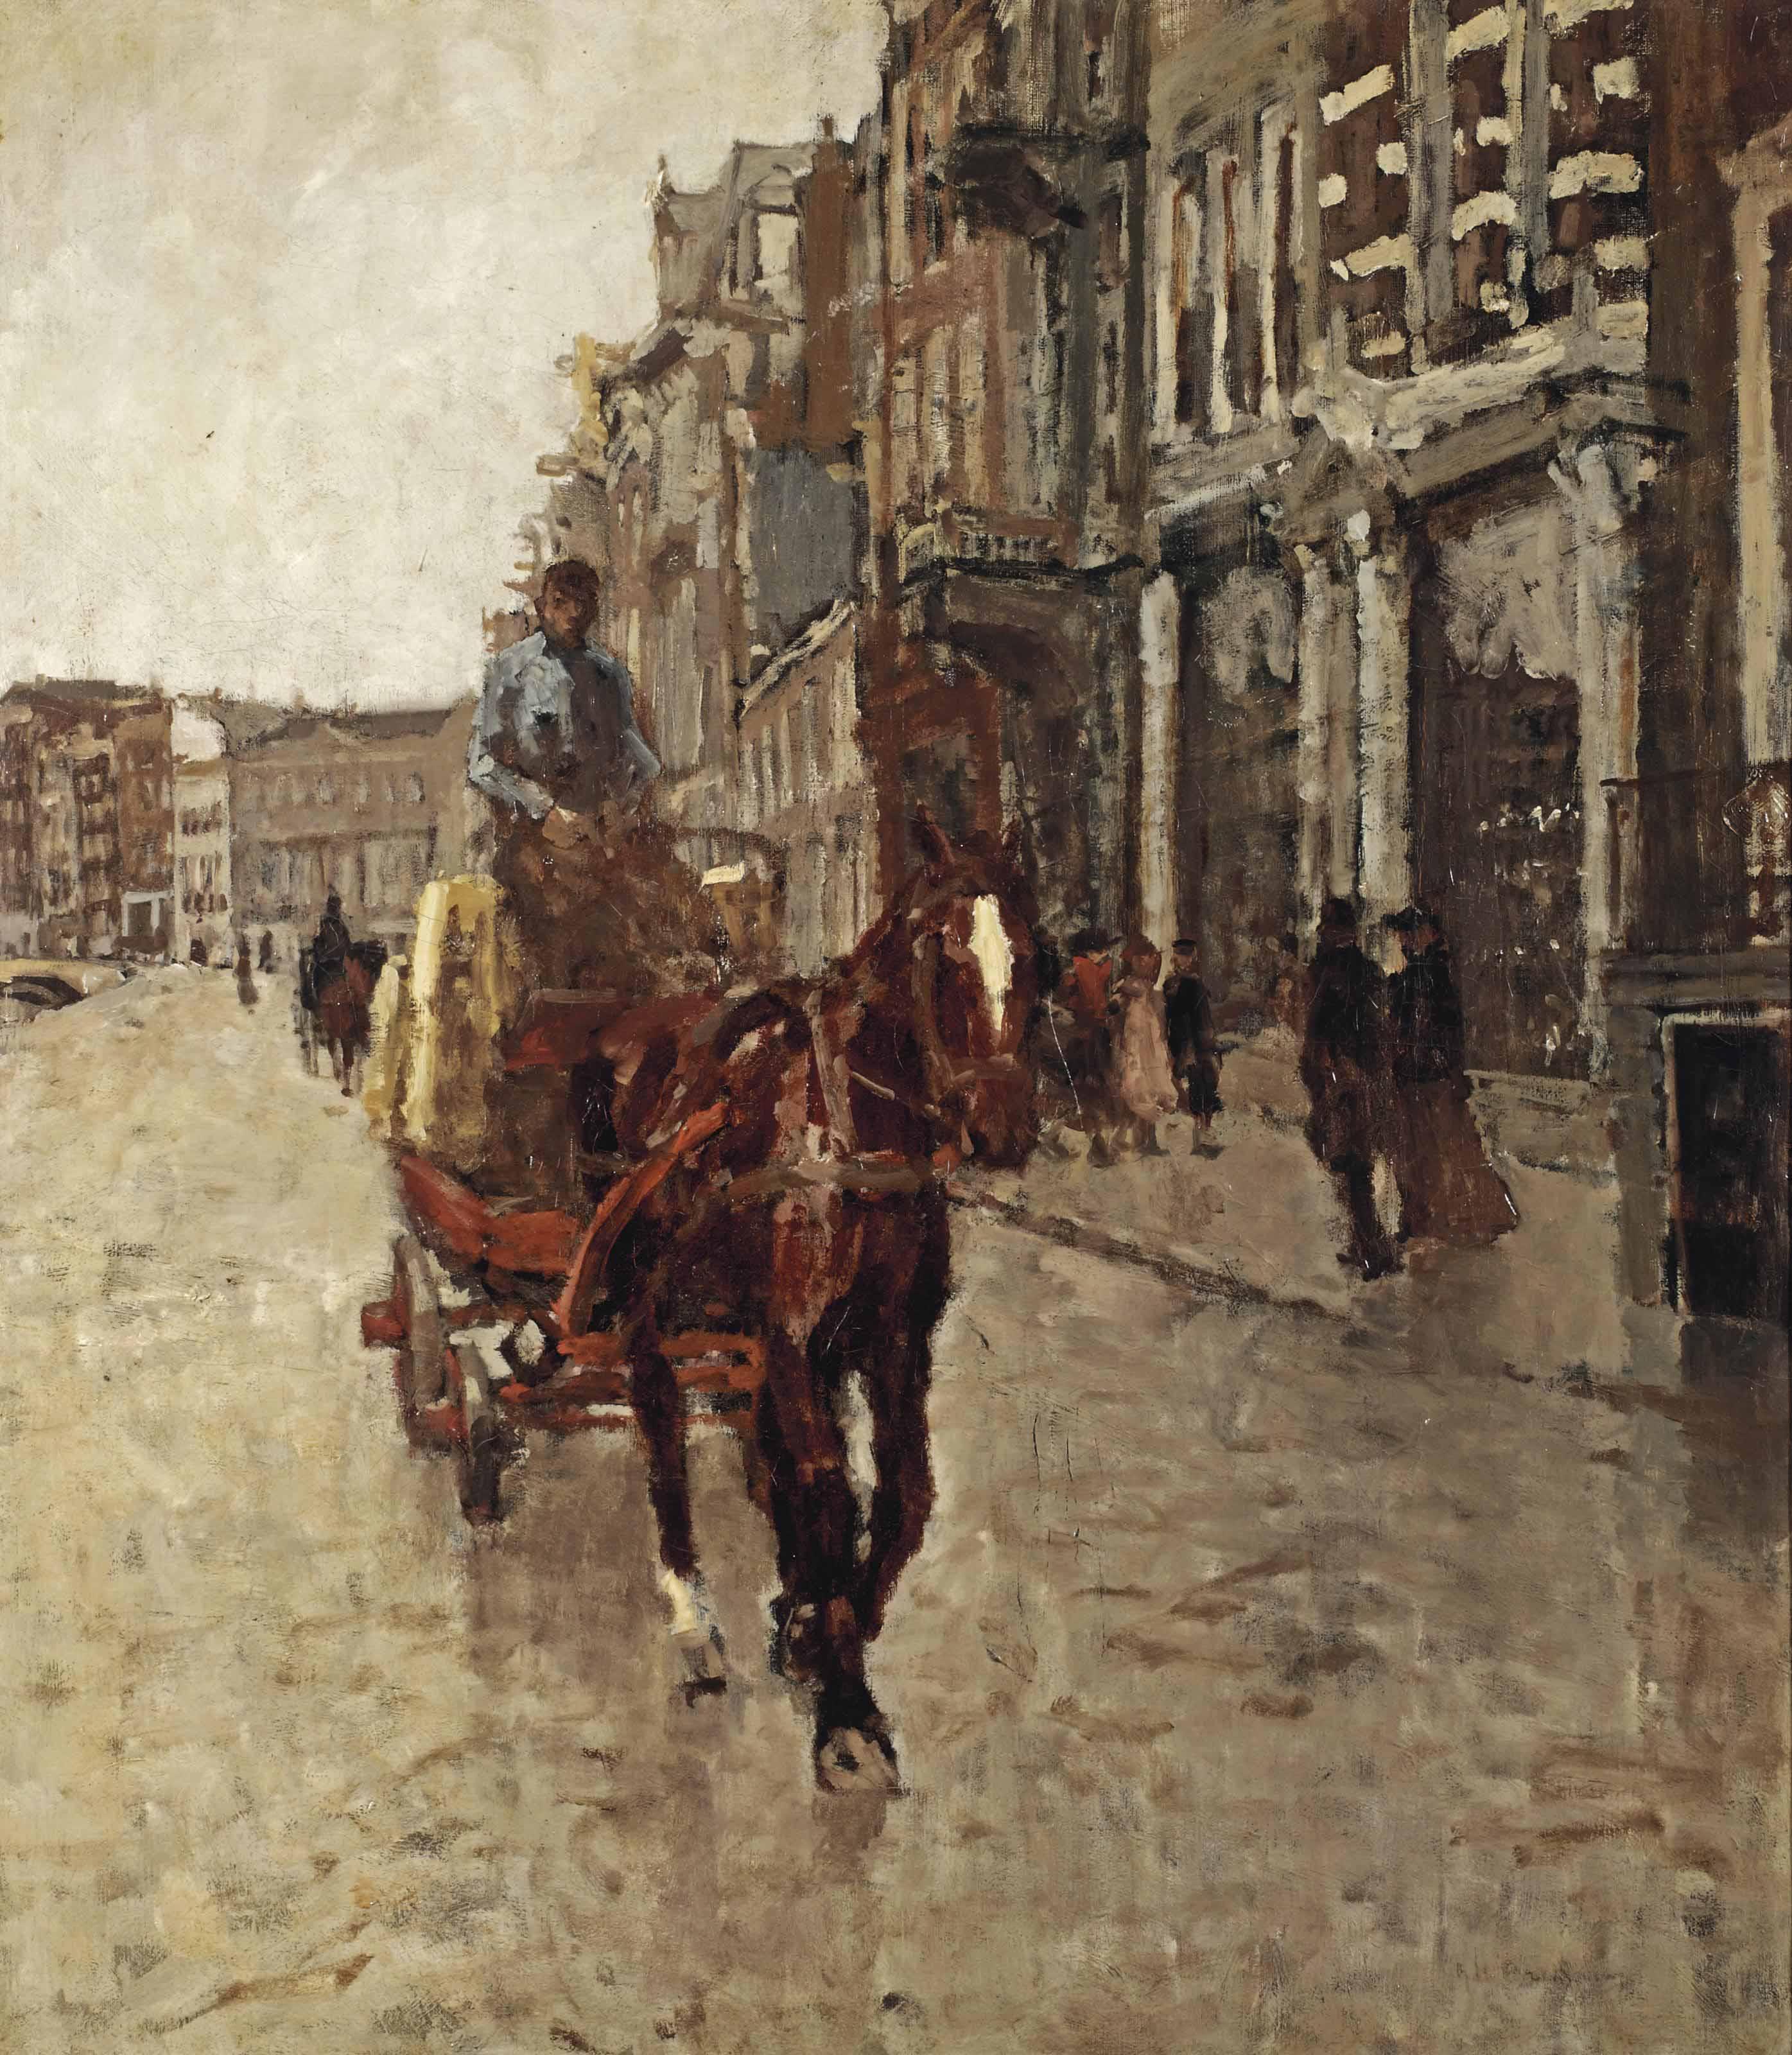 Rokin Westzijde: a horsedrawn cart on the Rokin, Amsterdam